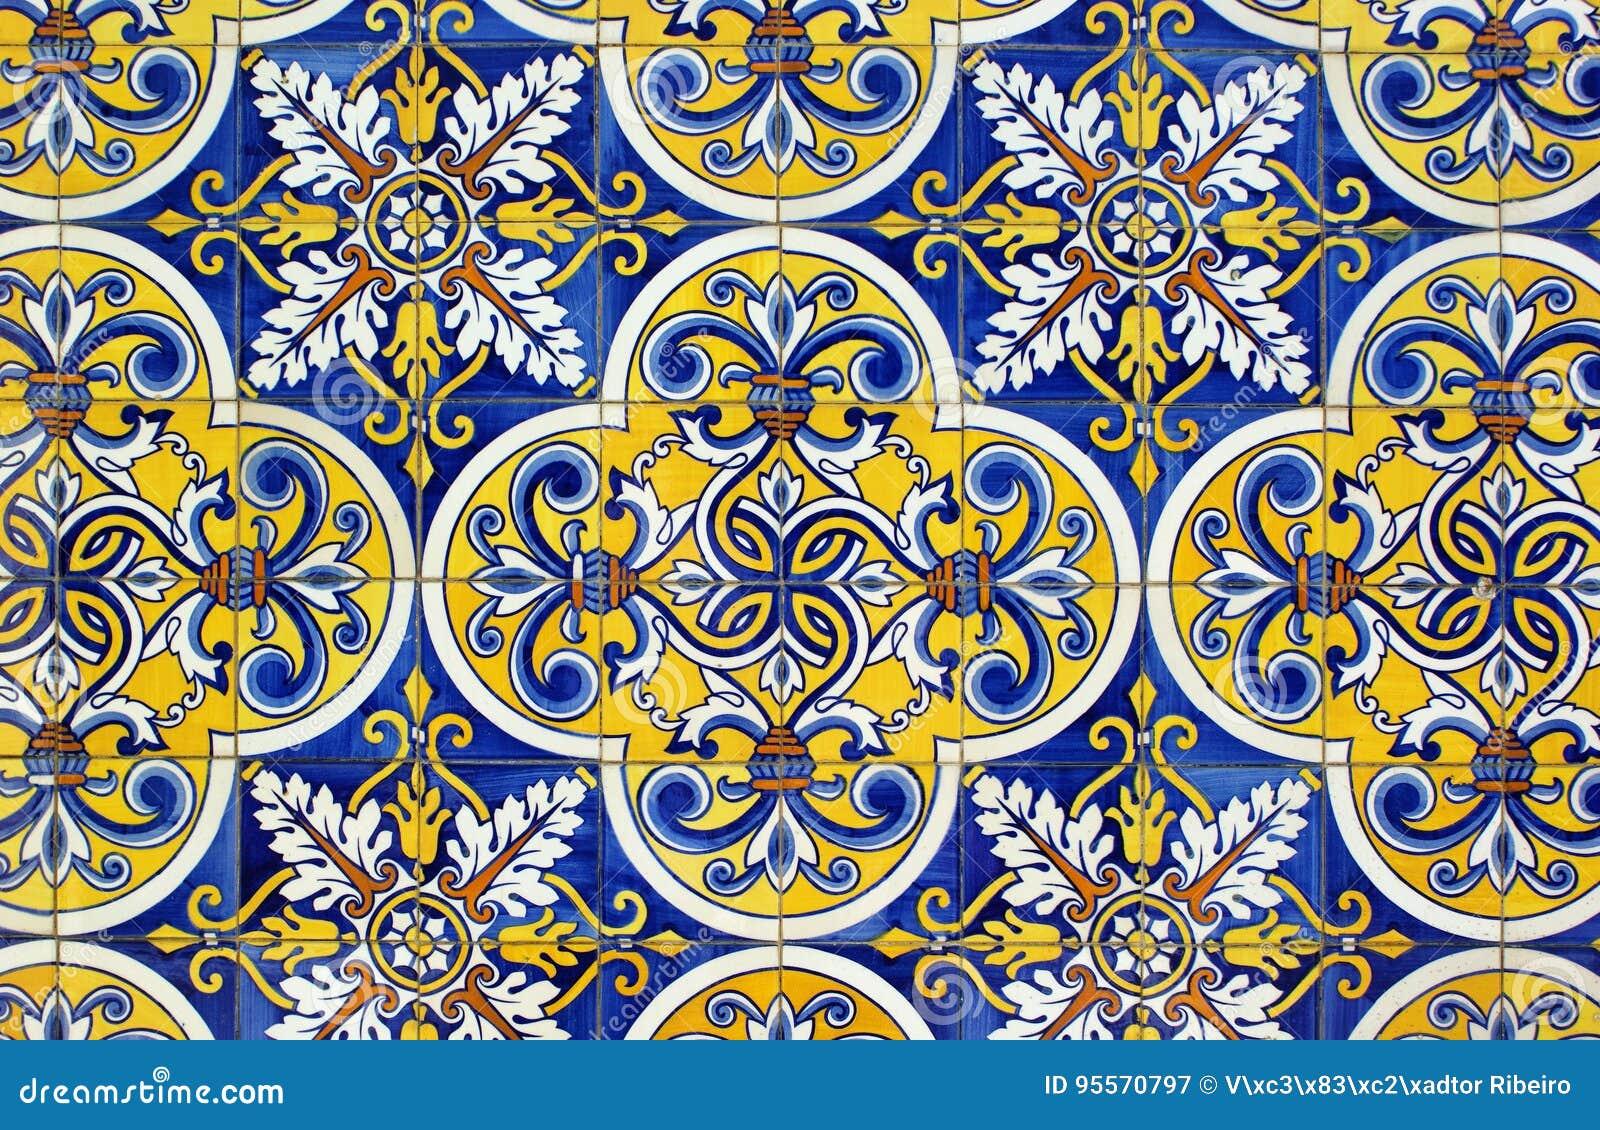 Traditional tiles in Santa Eulalia church